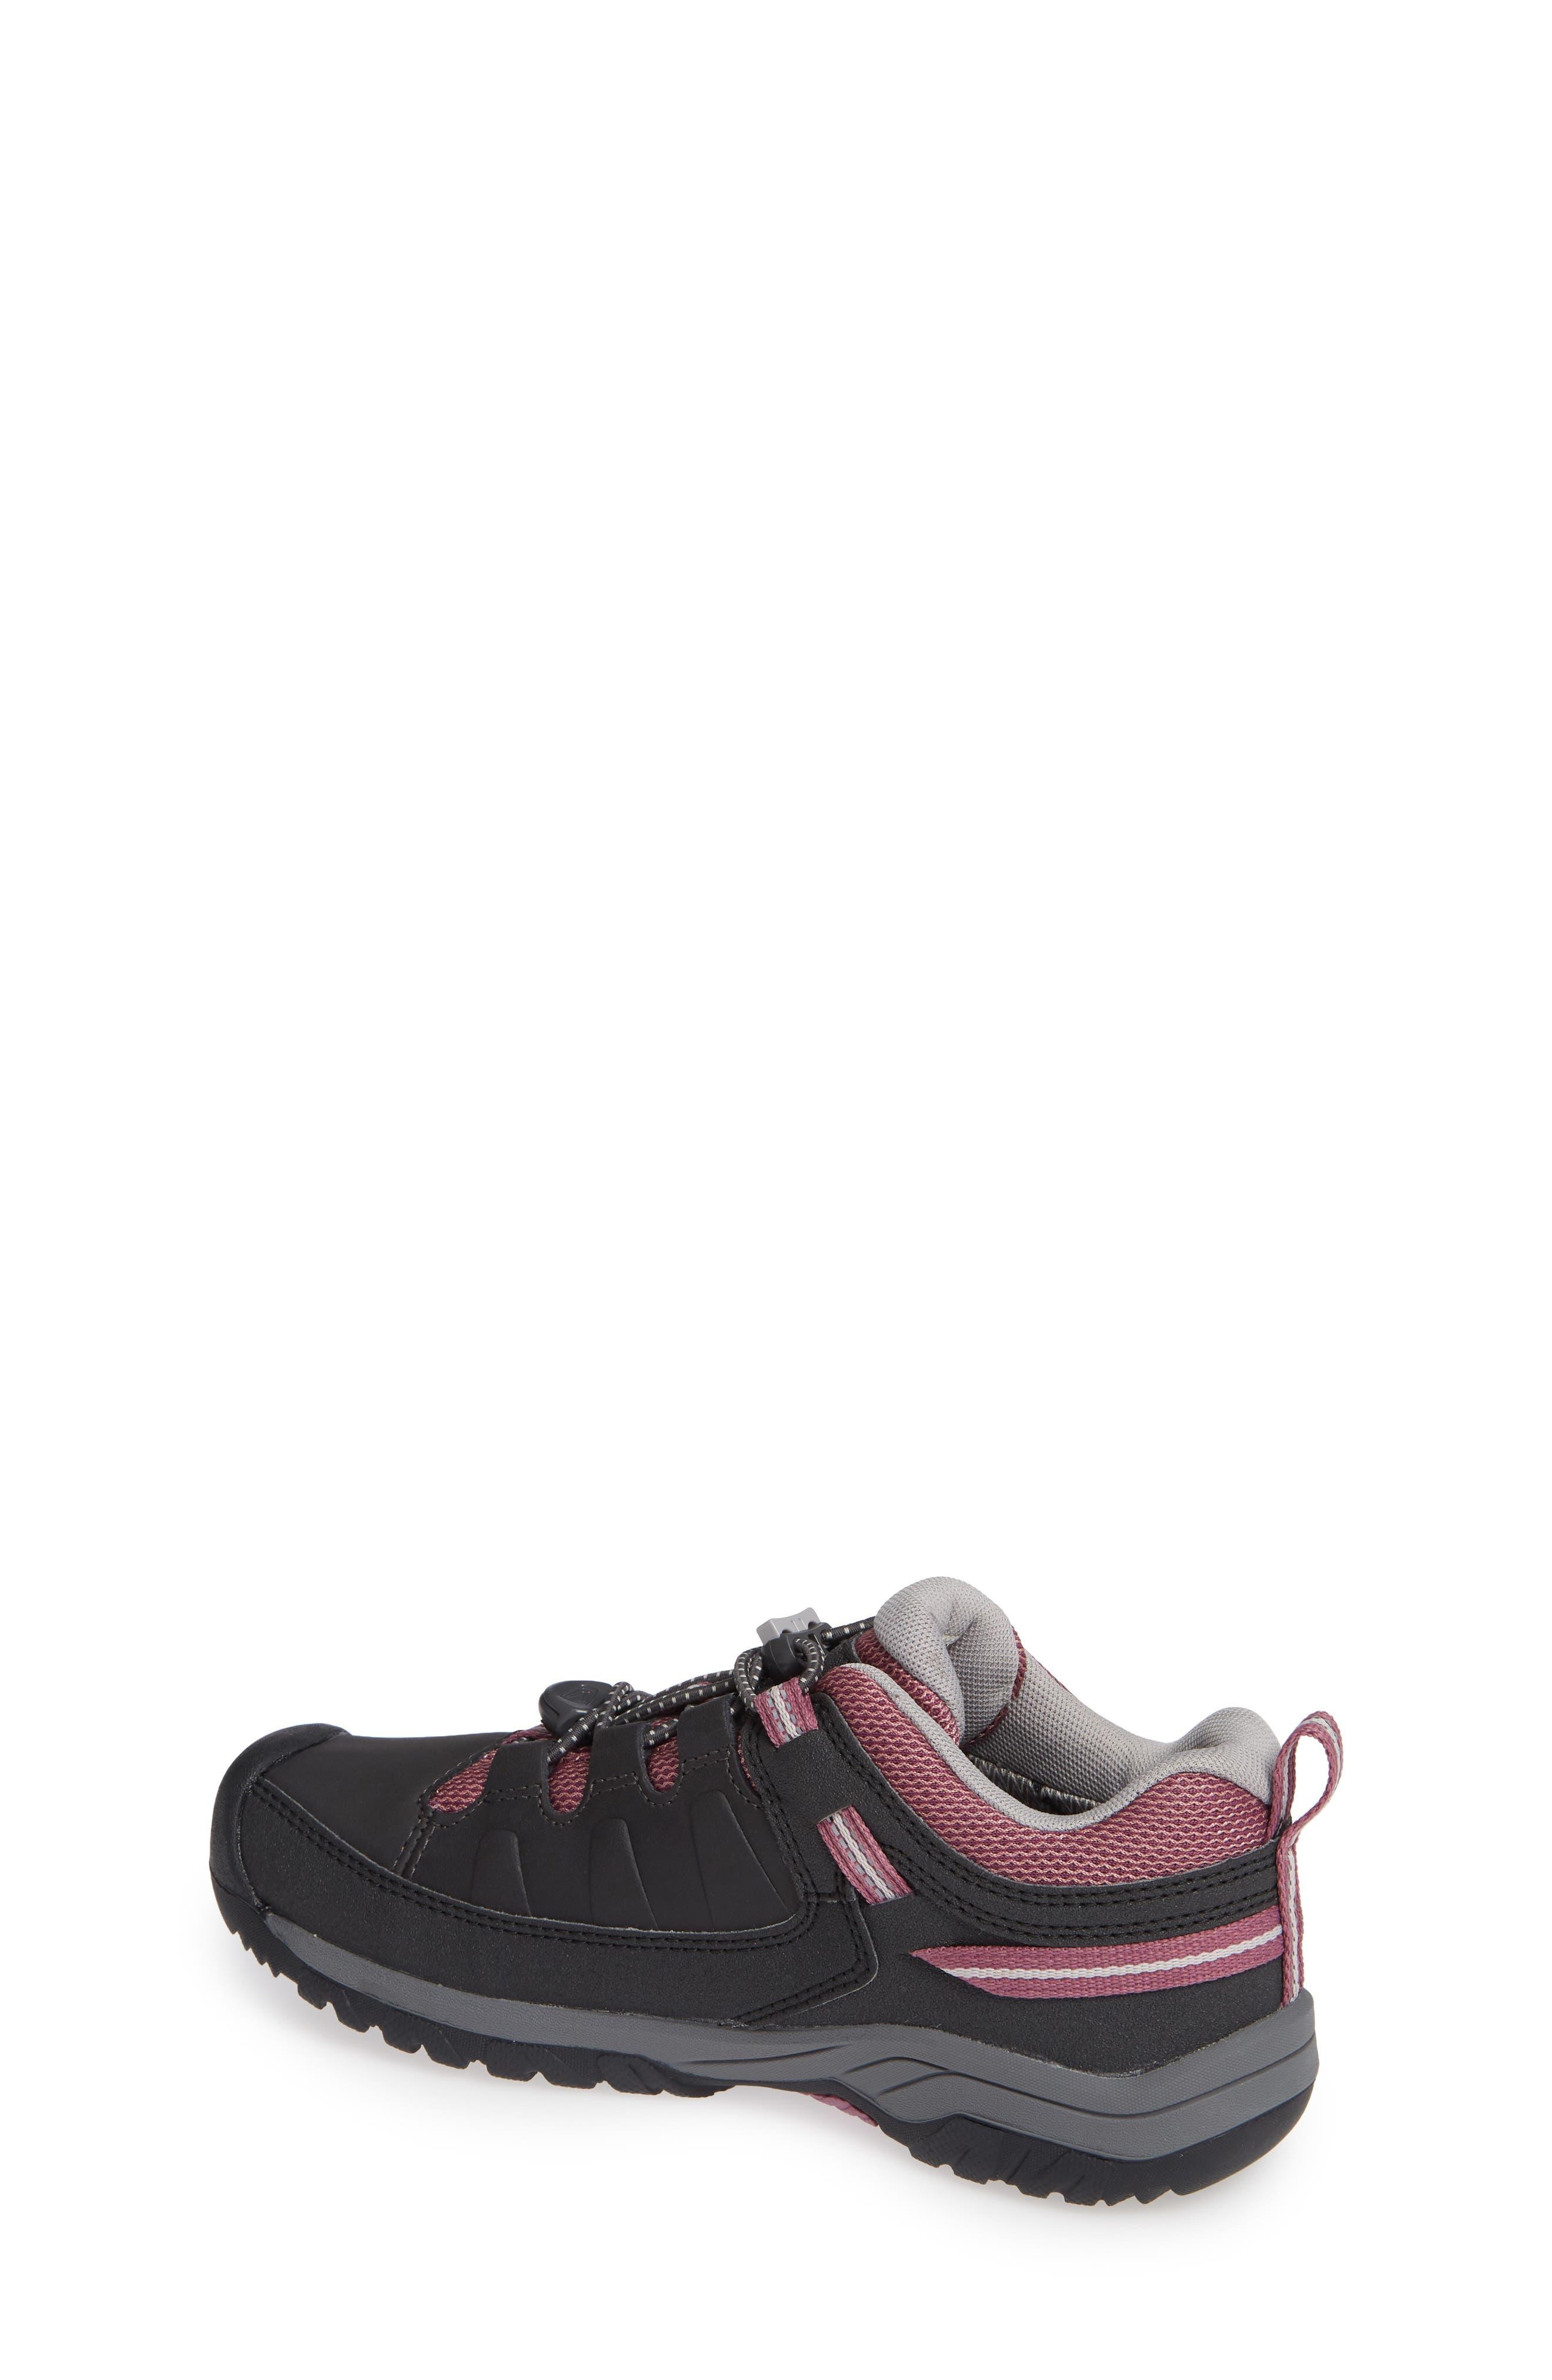 KEEN, Targhee Low Waterproof Boots, Alternate thumbnail 2, color, RAVEN/ TULIPWOOD/ TULIPWOOD